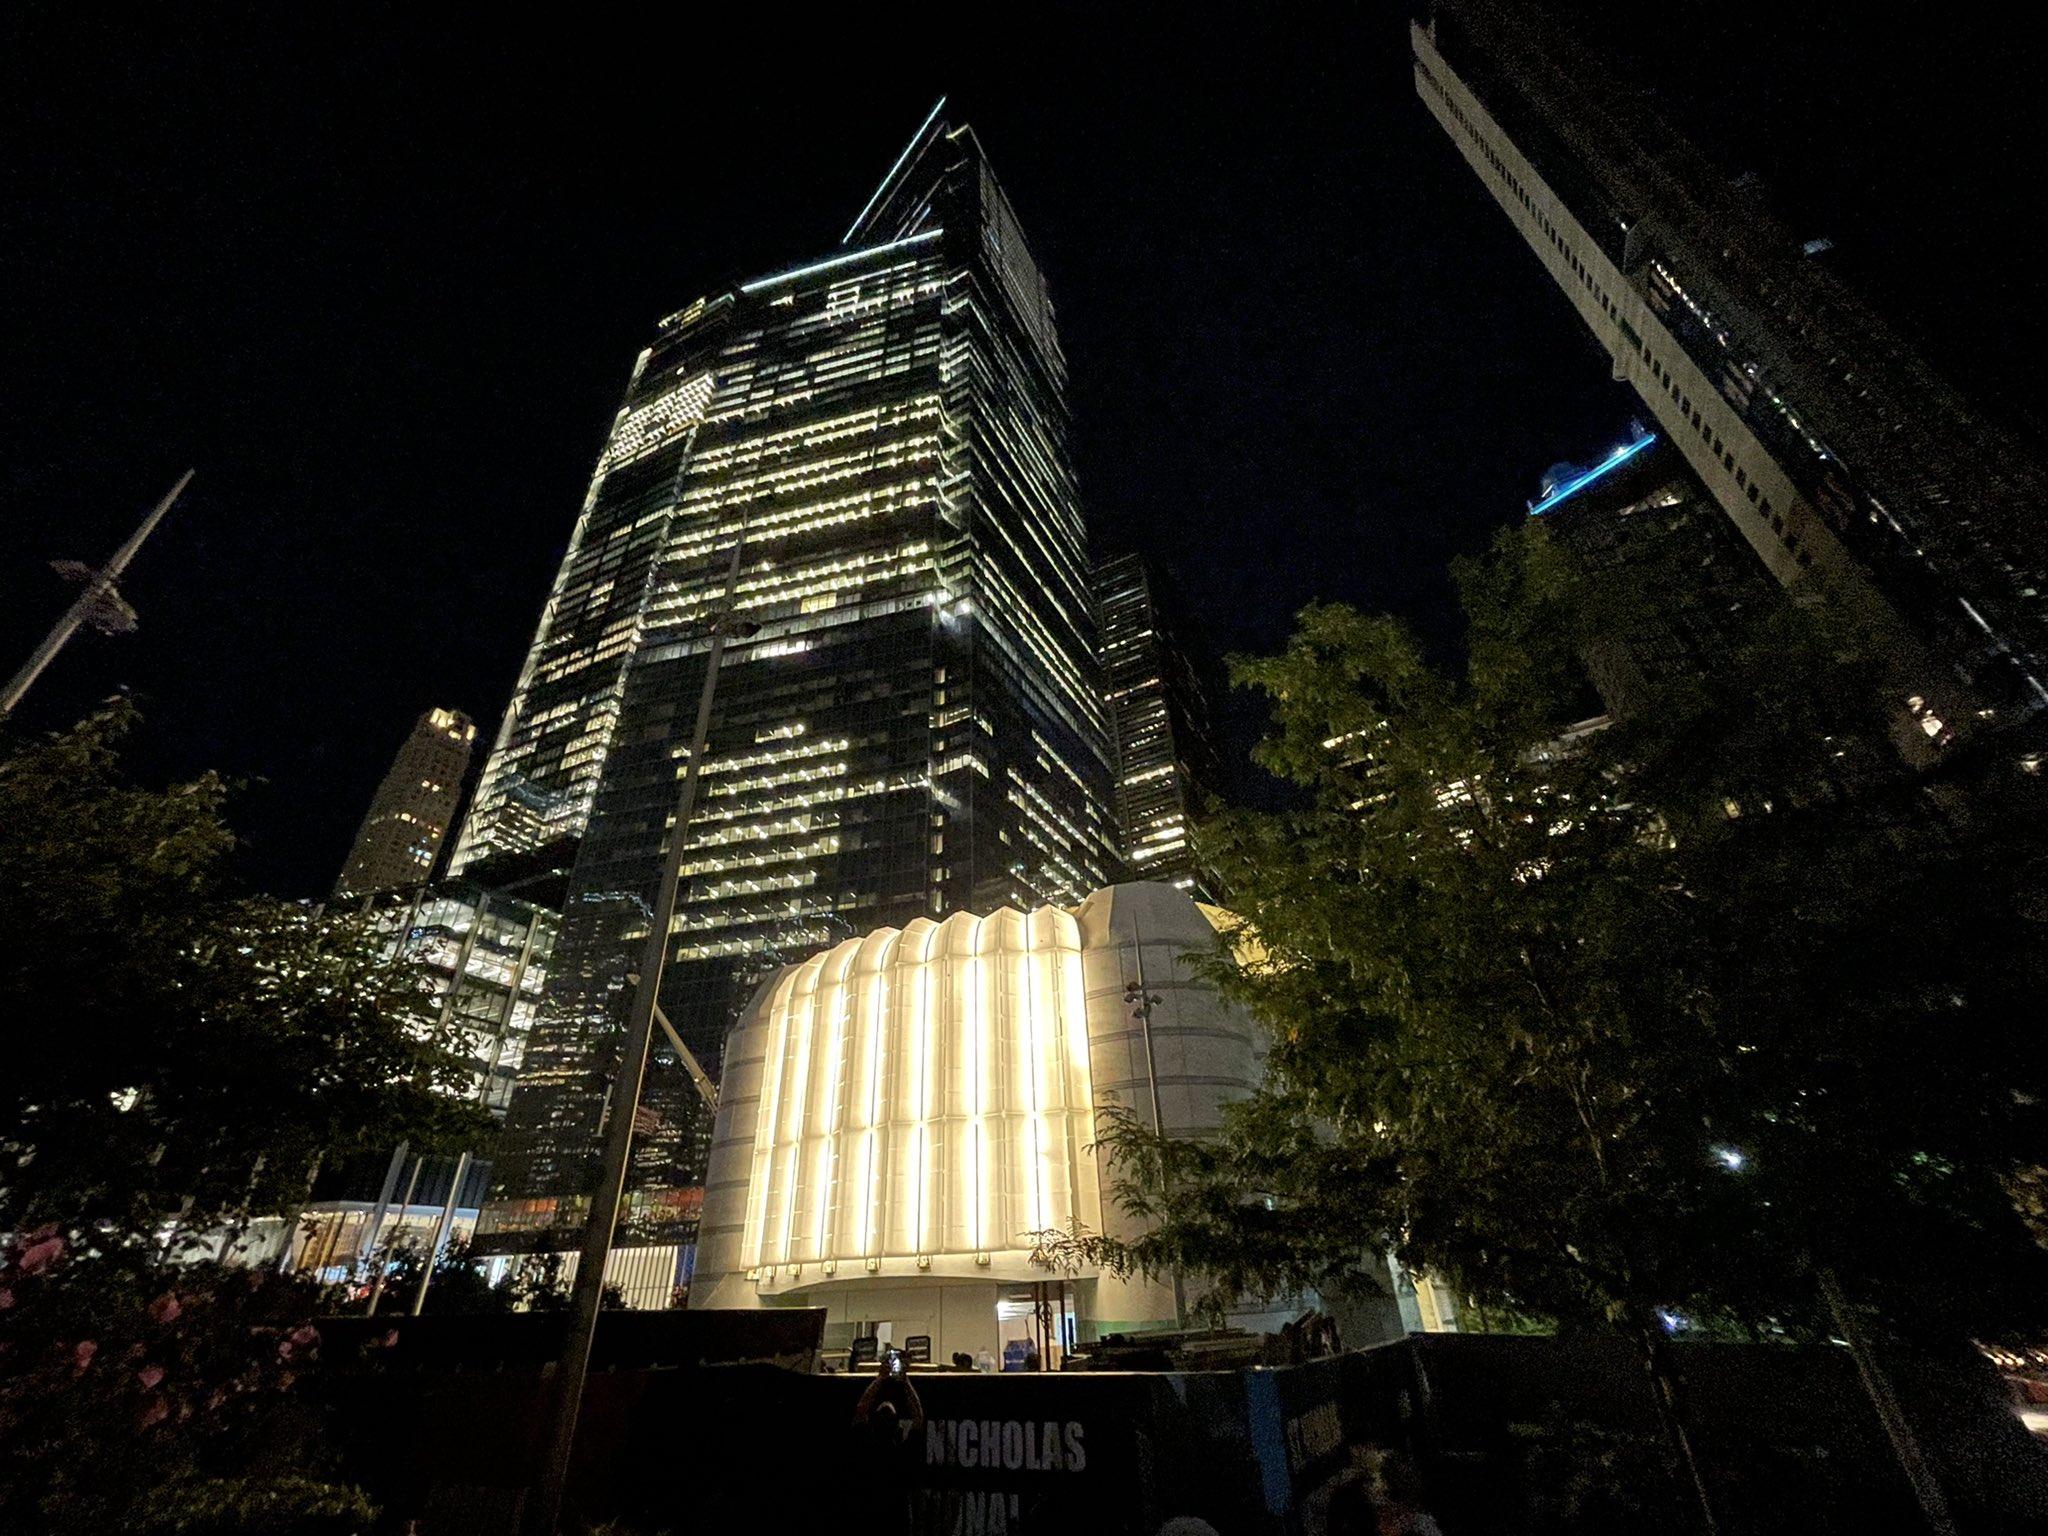 St. Nicholas 9/11